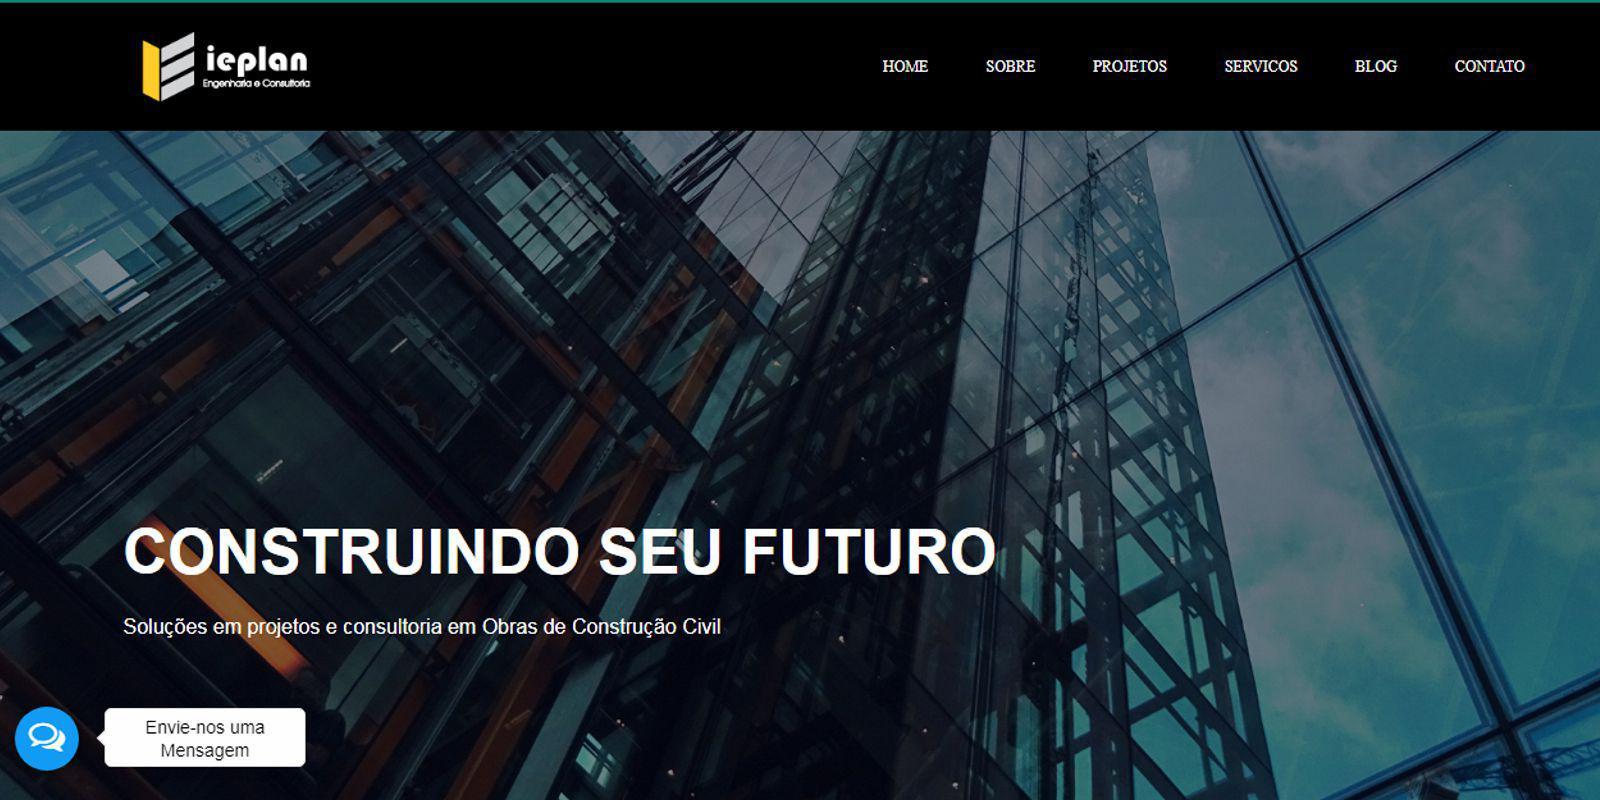 IEPLAN - Engenharia e Consultoria